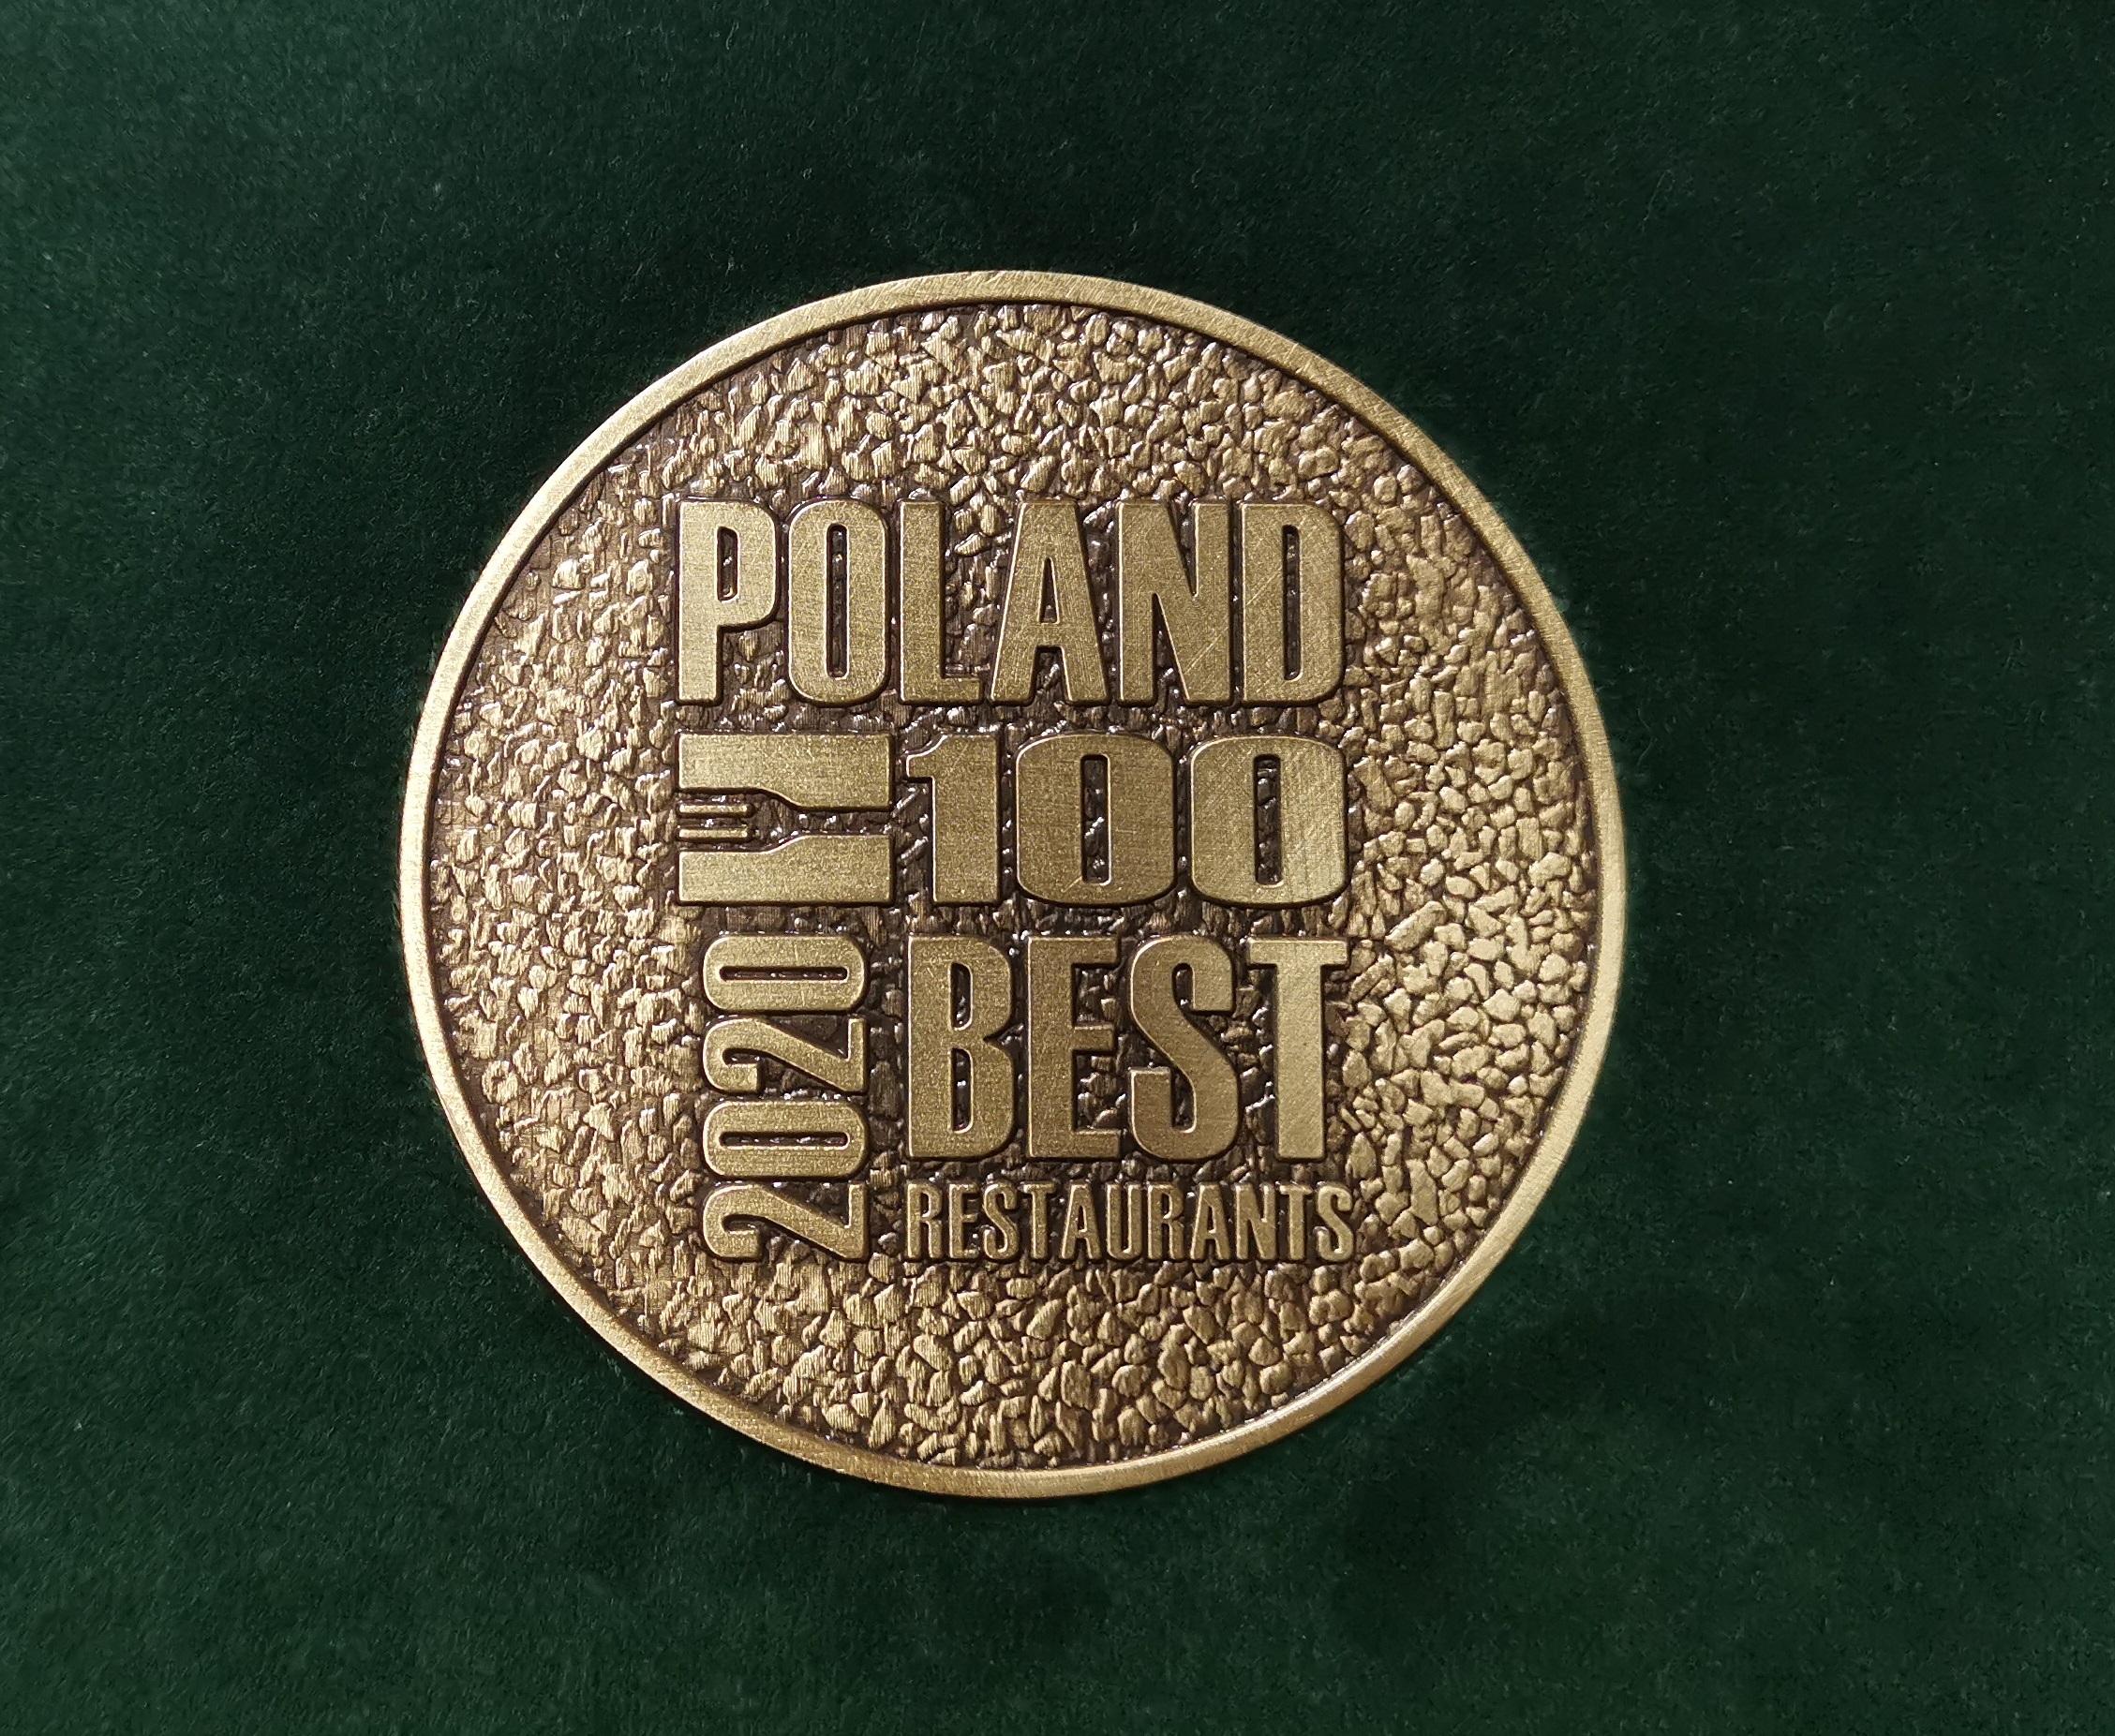 POLAND 100 BEST RESTAURANT AWARDS 2020